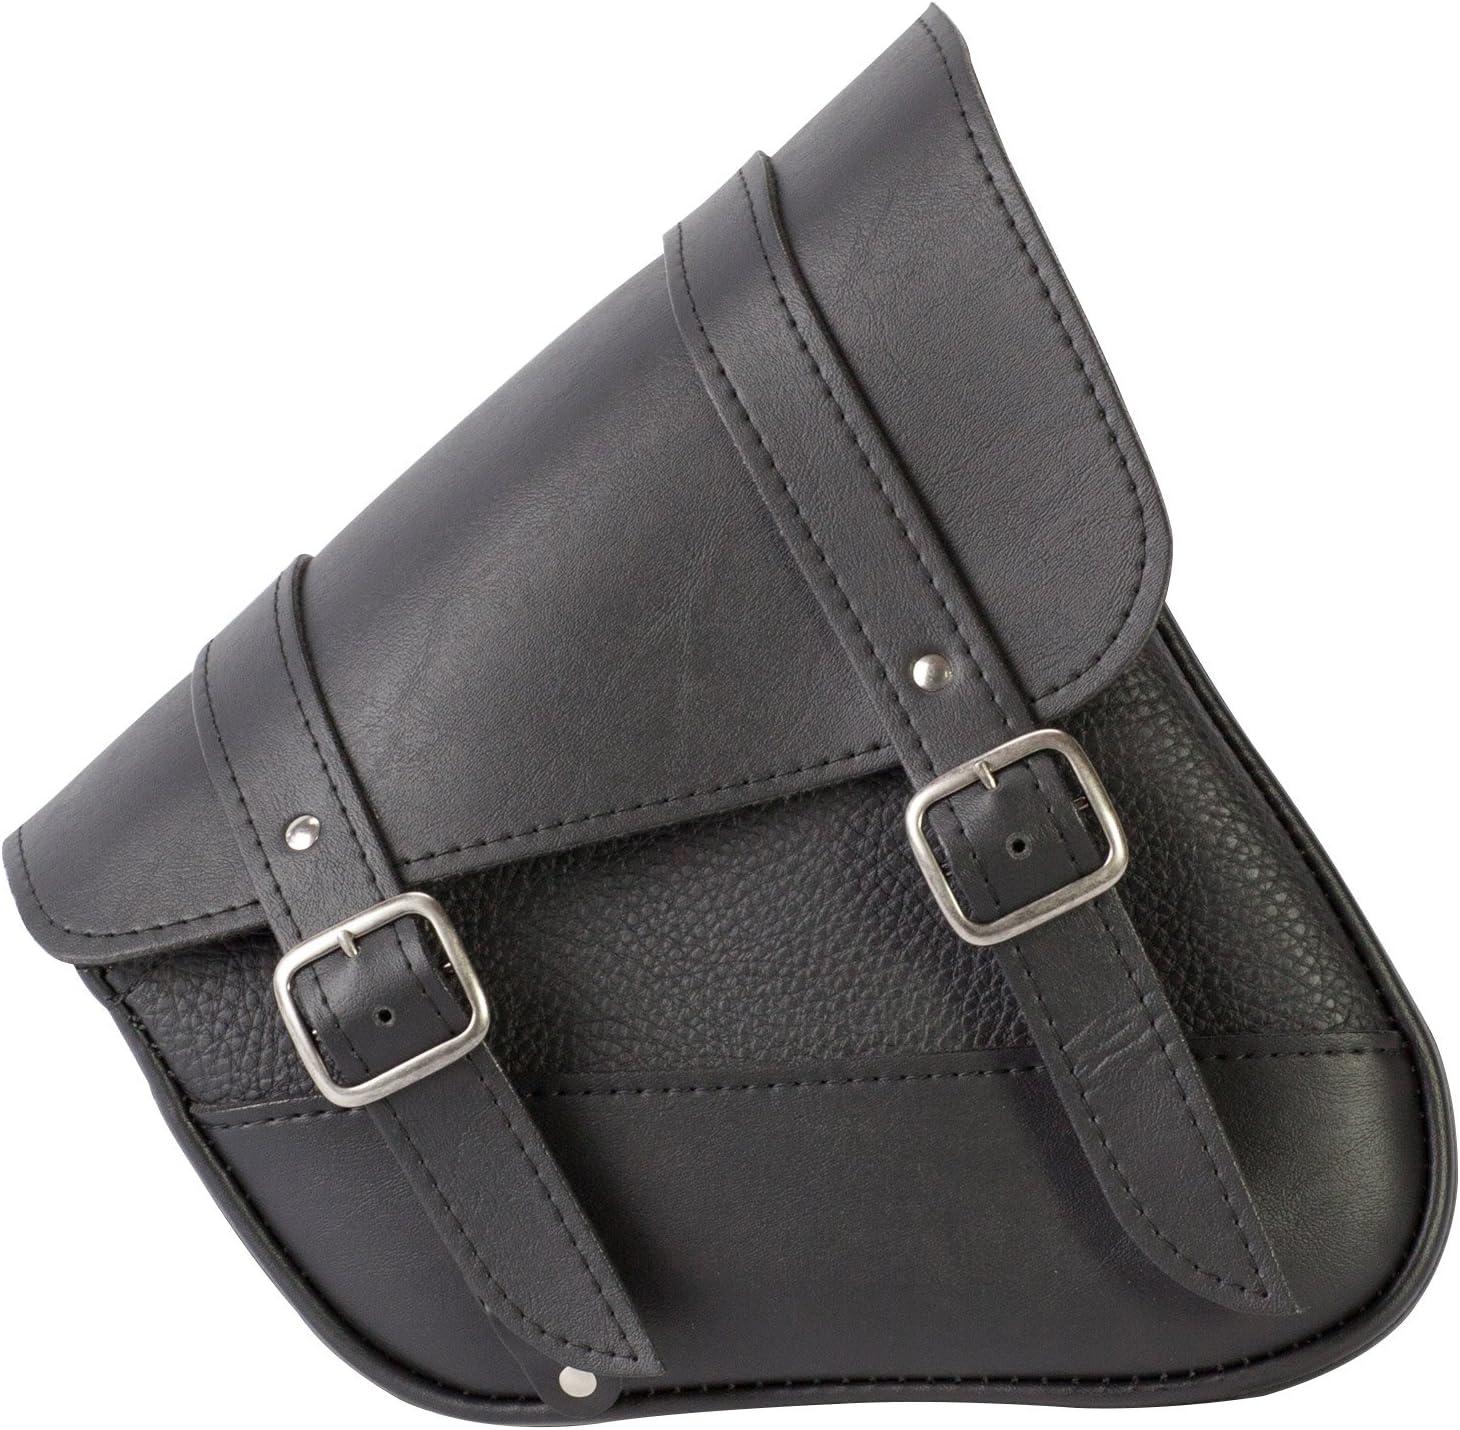 Dowco Willie & Max 59778-00 Synthetic Leather Swingarm Bag: Black, Fits Dual Shock Bikes/Sportster/Yamaha Bolt, 9 Liter Capacity